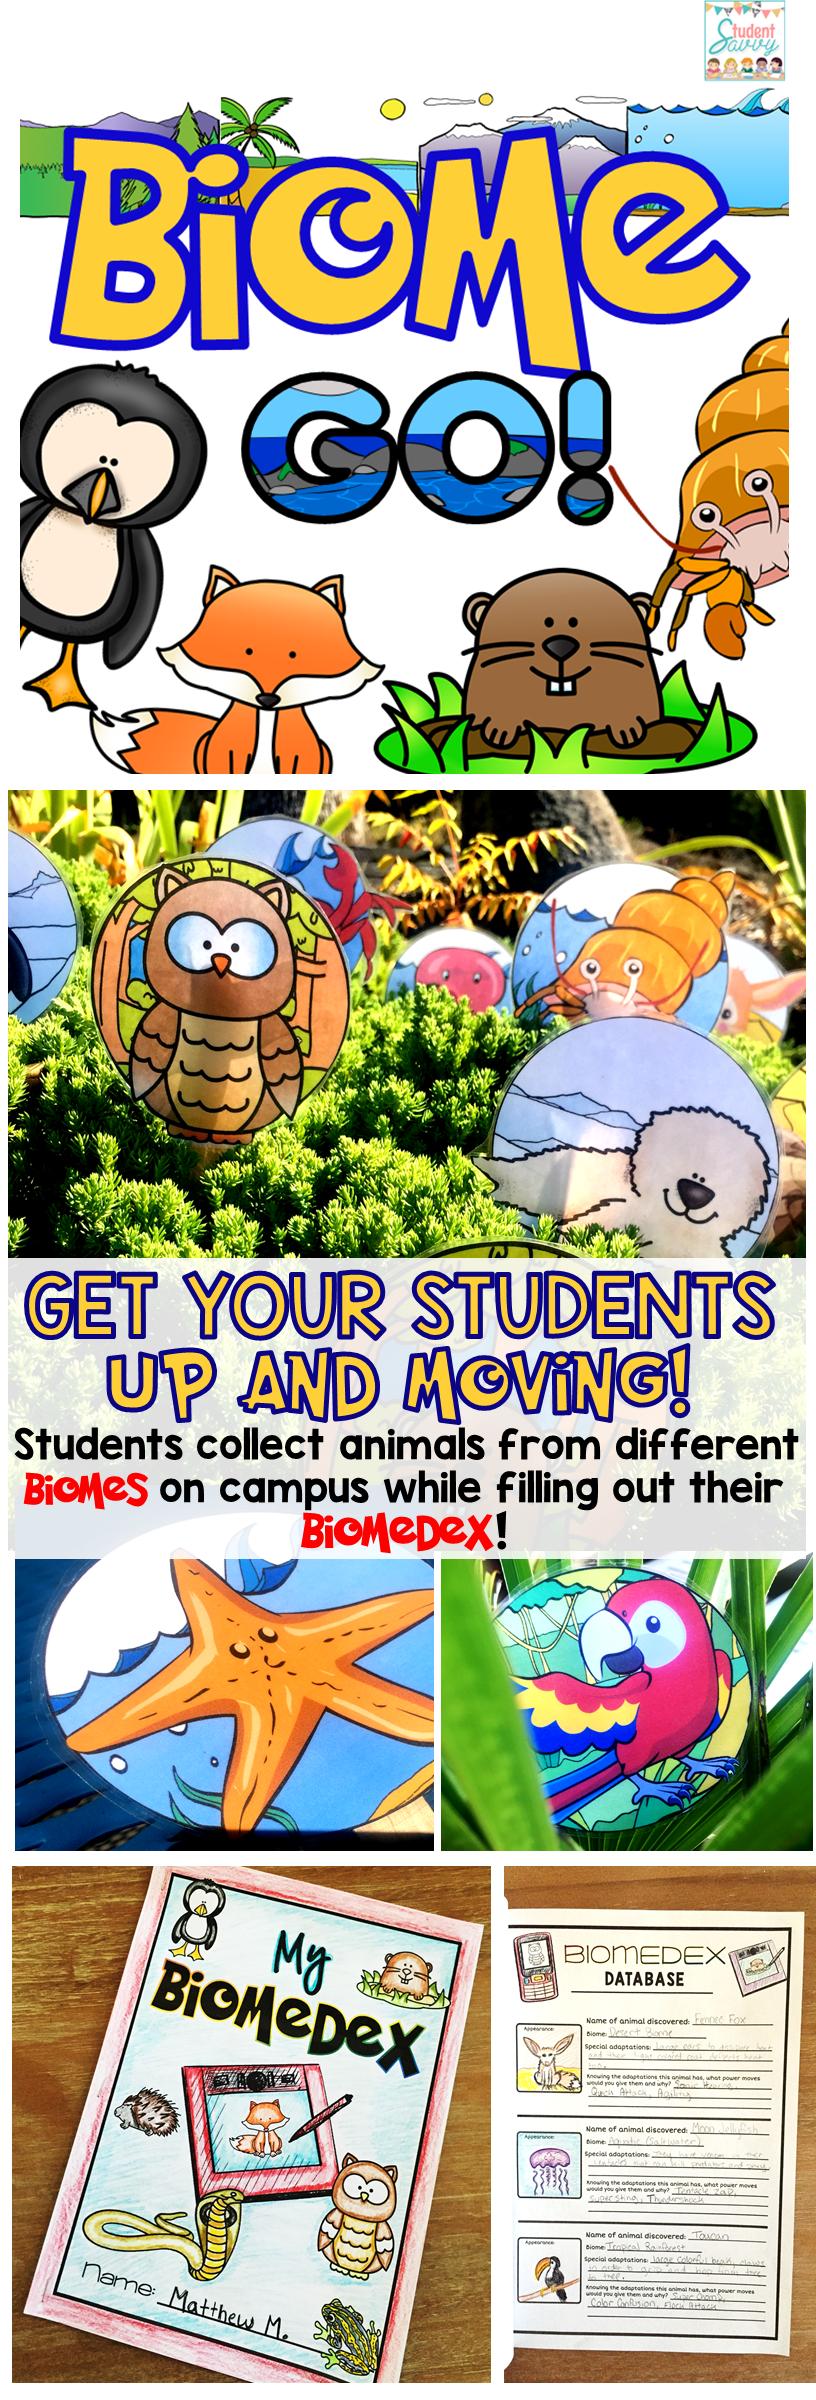 Biome GO! Animal adaptations, Biomes, Teaching biology